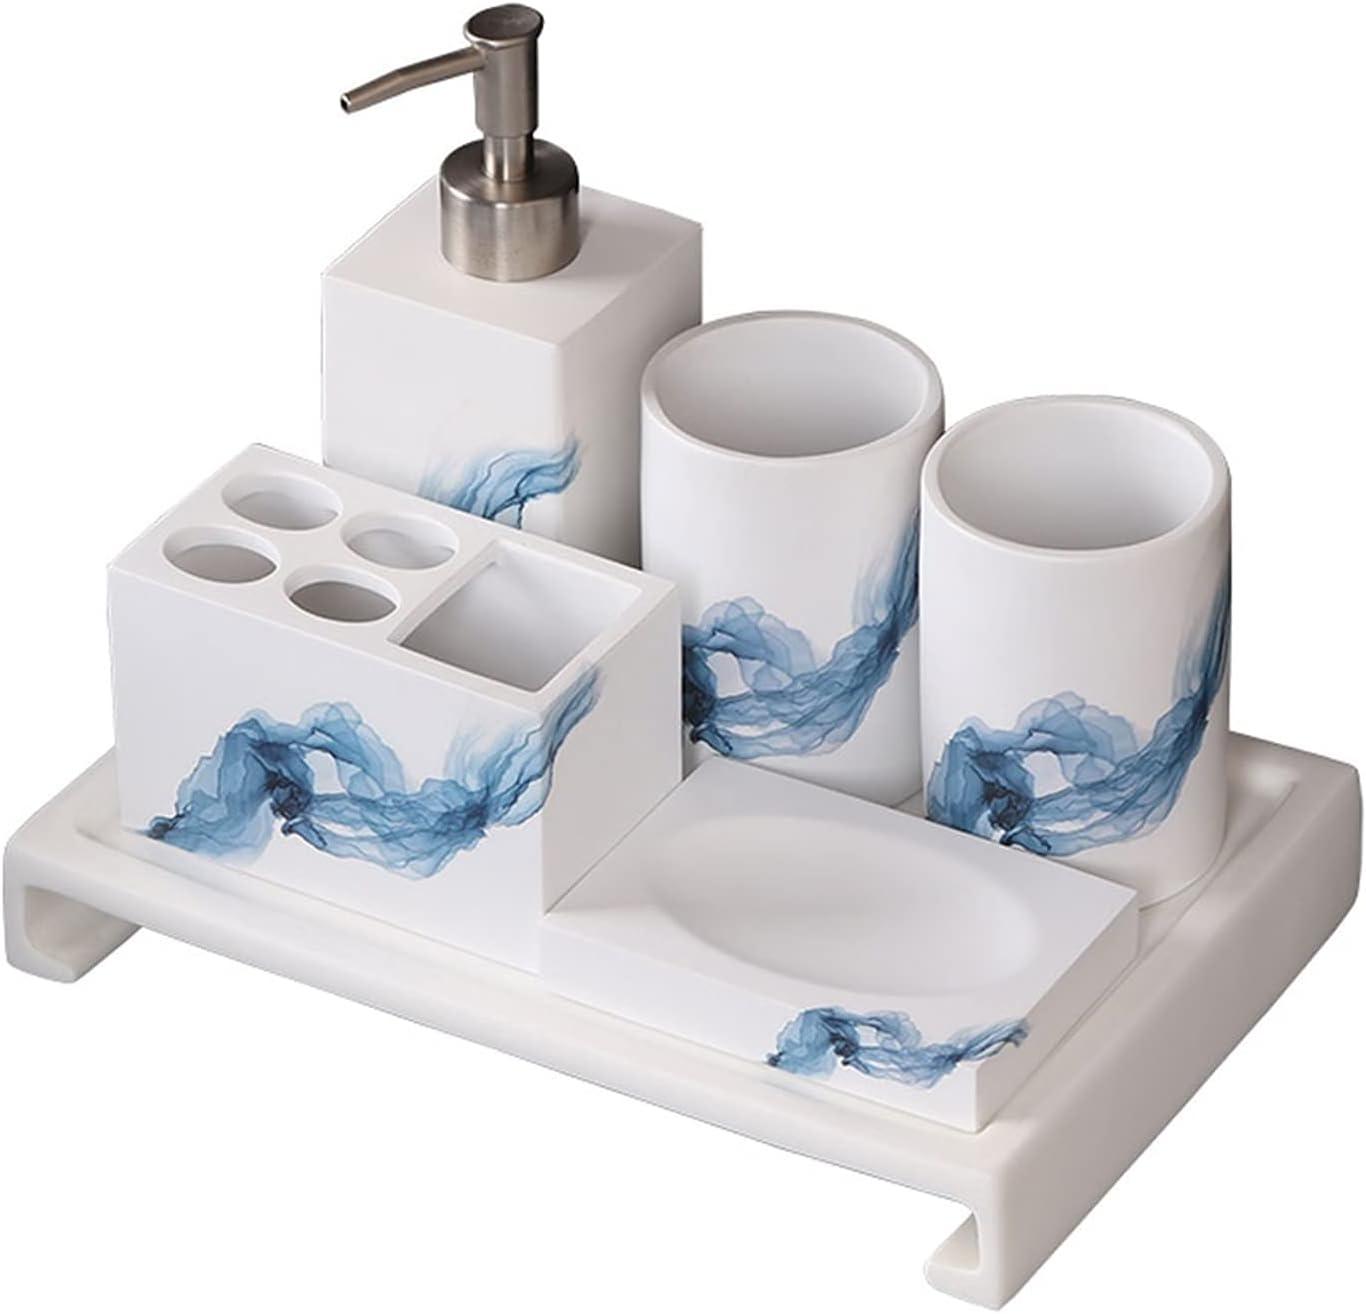 Soap Max 48% OFF Dispenser Bottle Lotion White All items in the store Bathro 6Pcs Ceramic